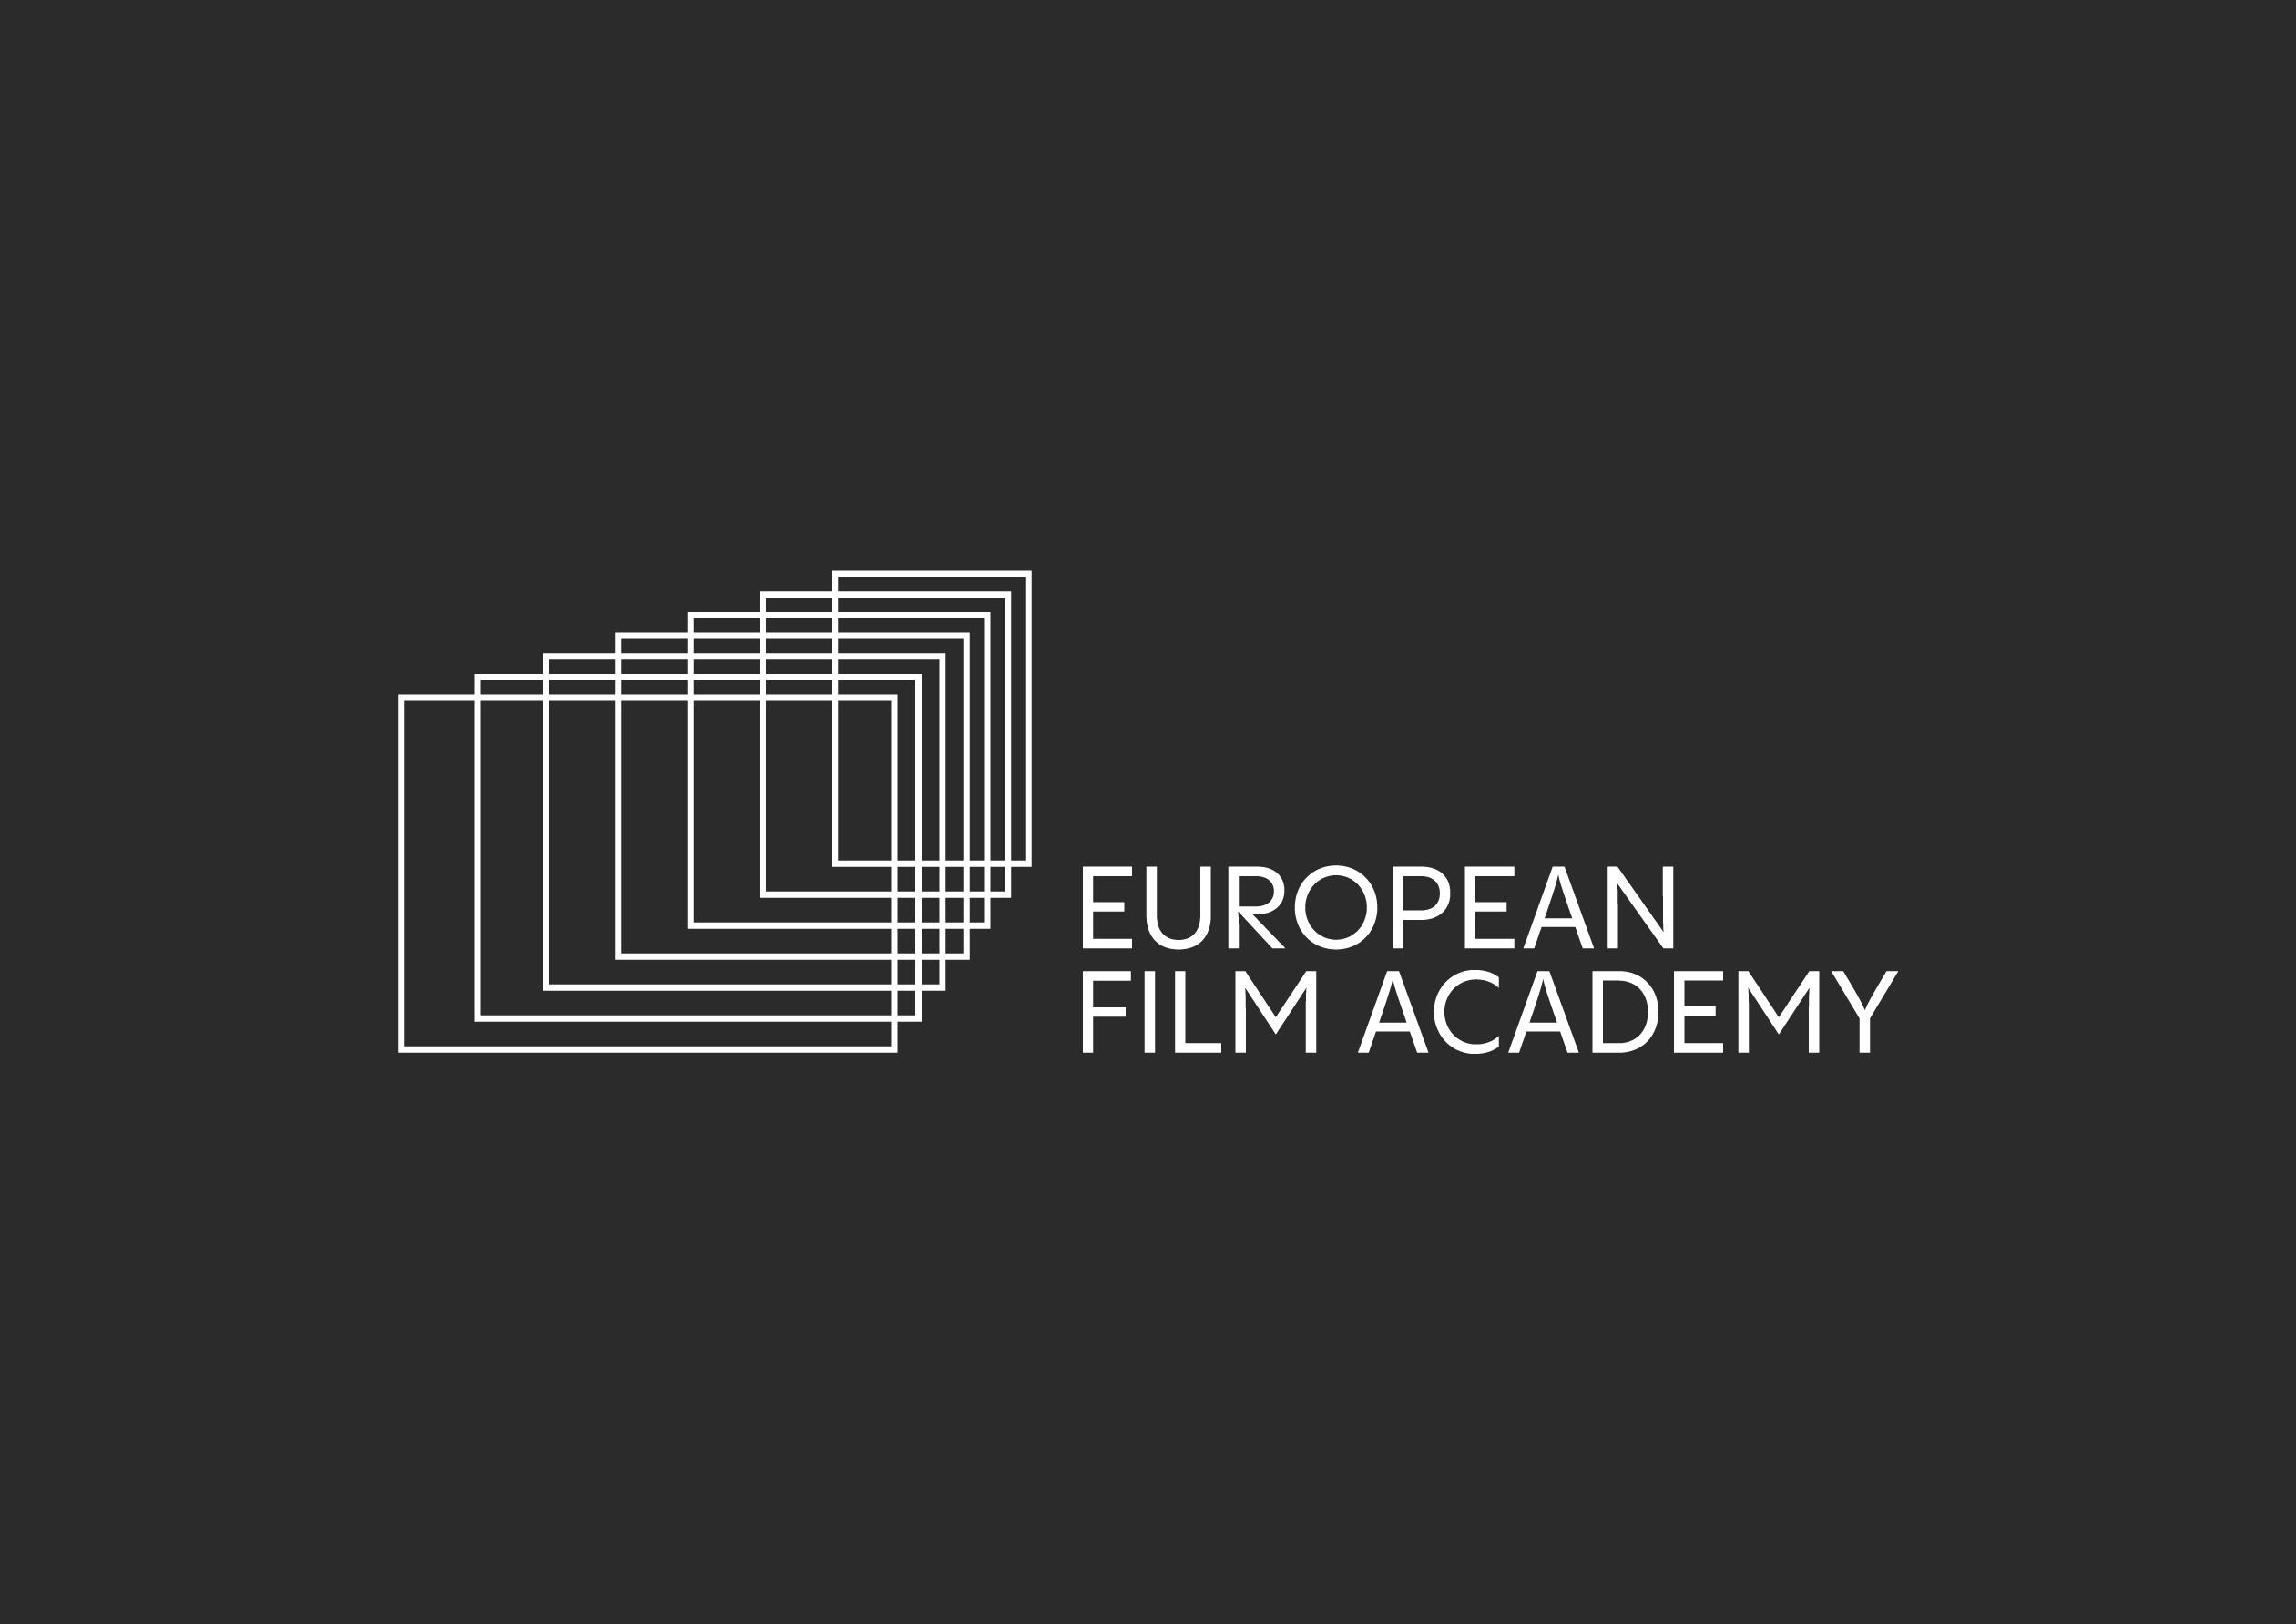 EFA_logotype_Horizontal_White_Black